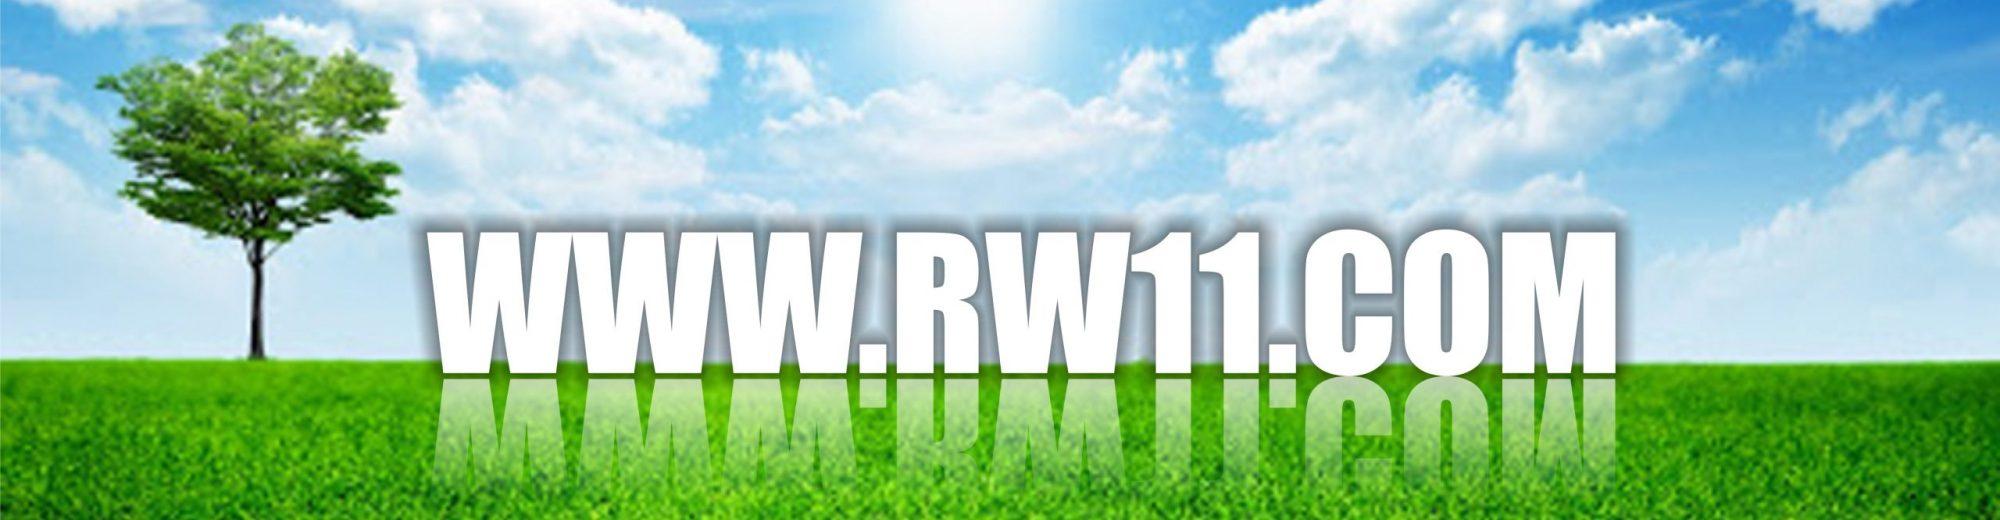 www.rw11.com